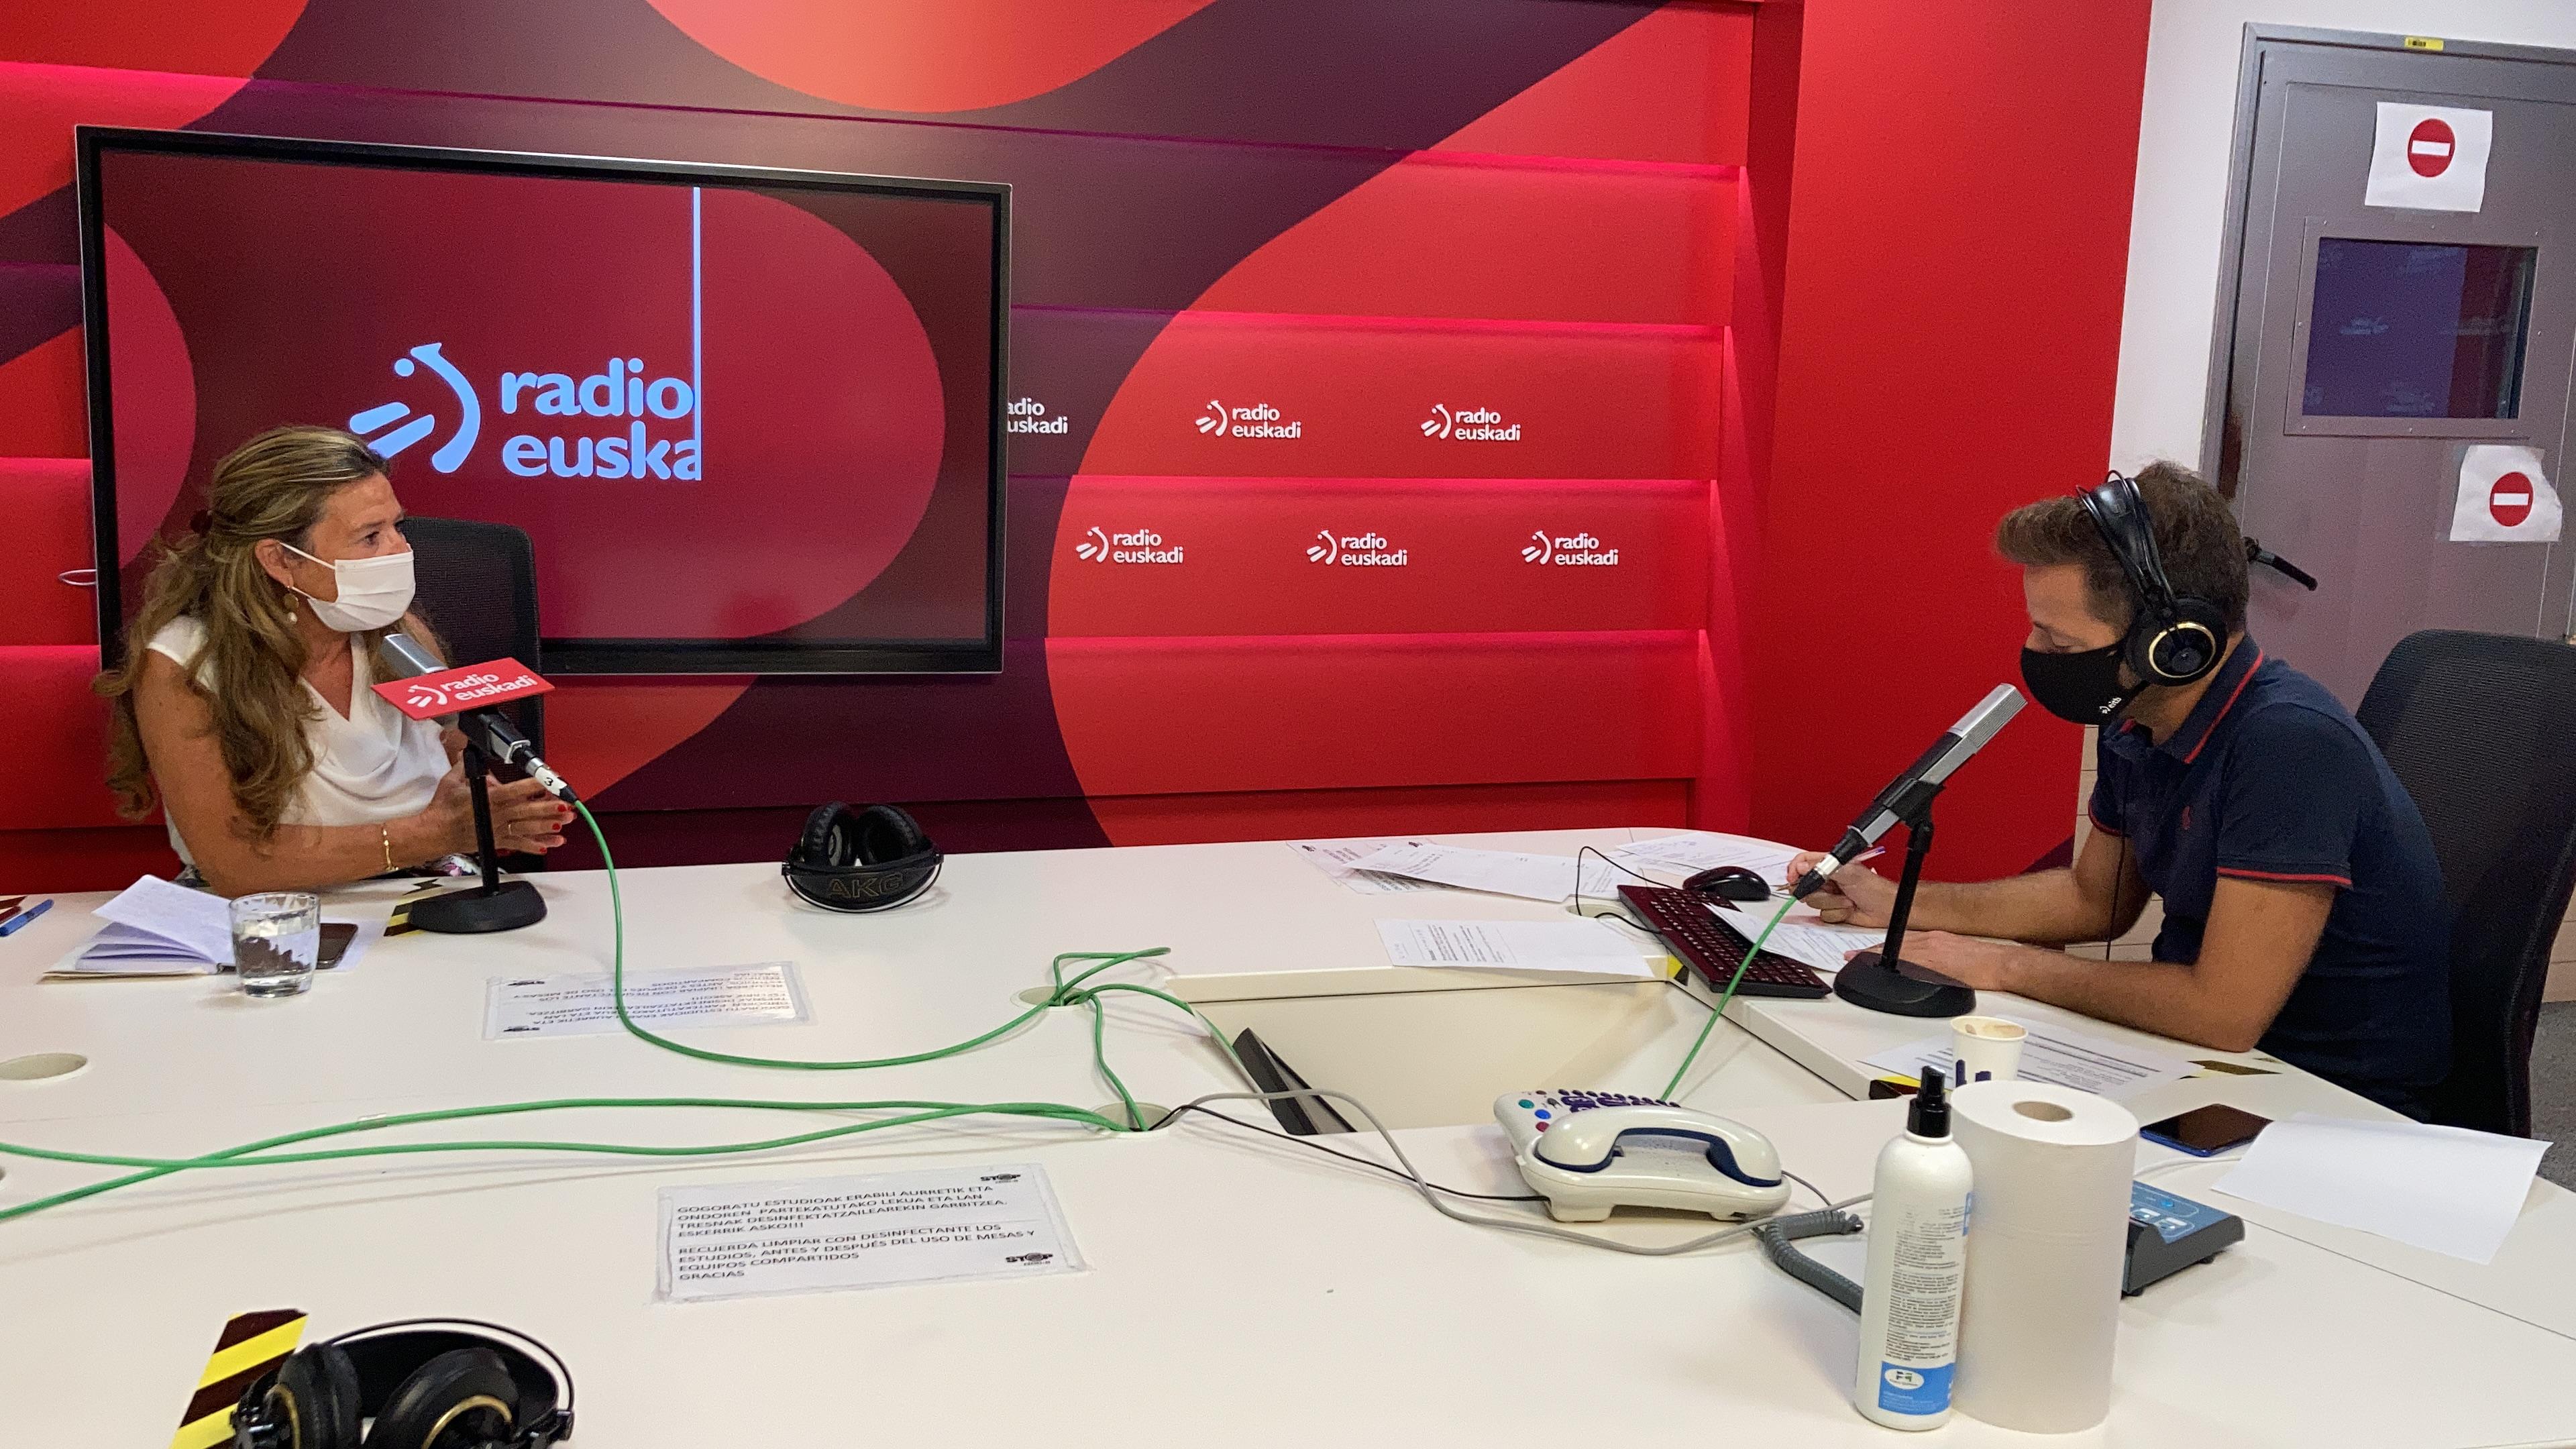 Sagardui_Radio_Euskadi_03.jpg